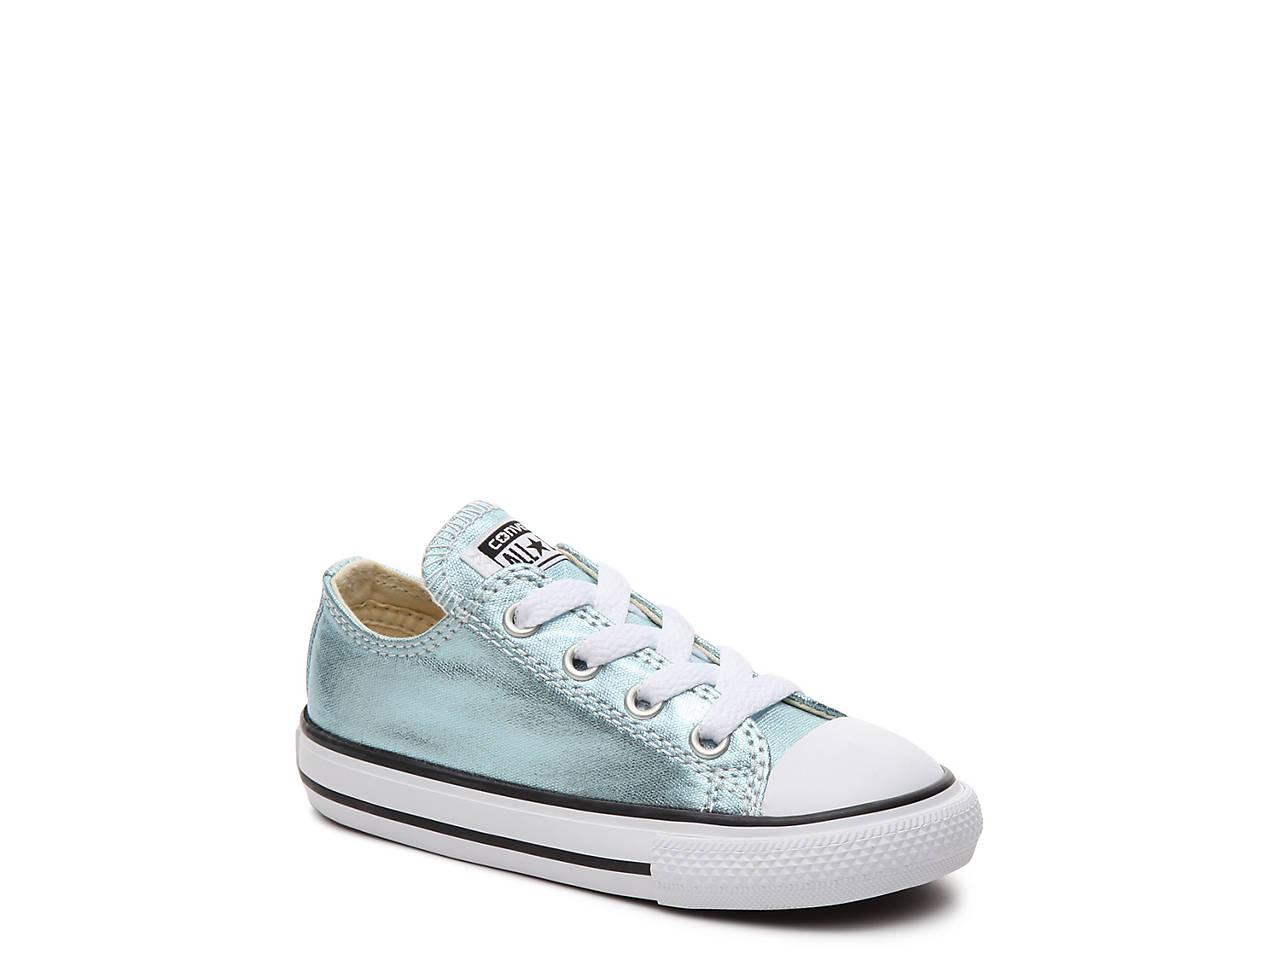 23cba82c5a0d Converse Chuck Taylor All Star Metallic Infant   Toddler Sneaker ...